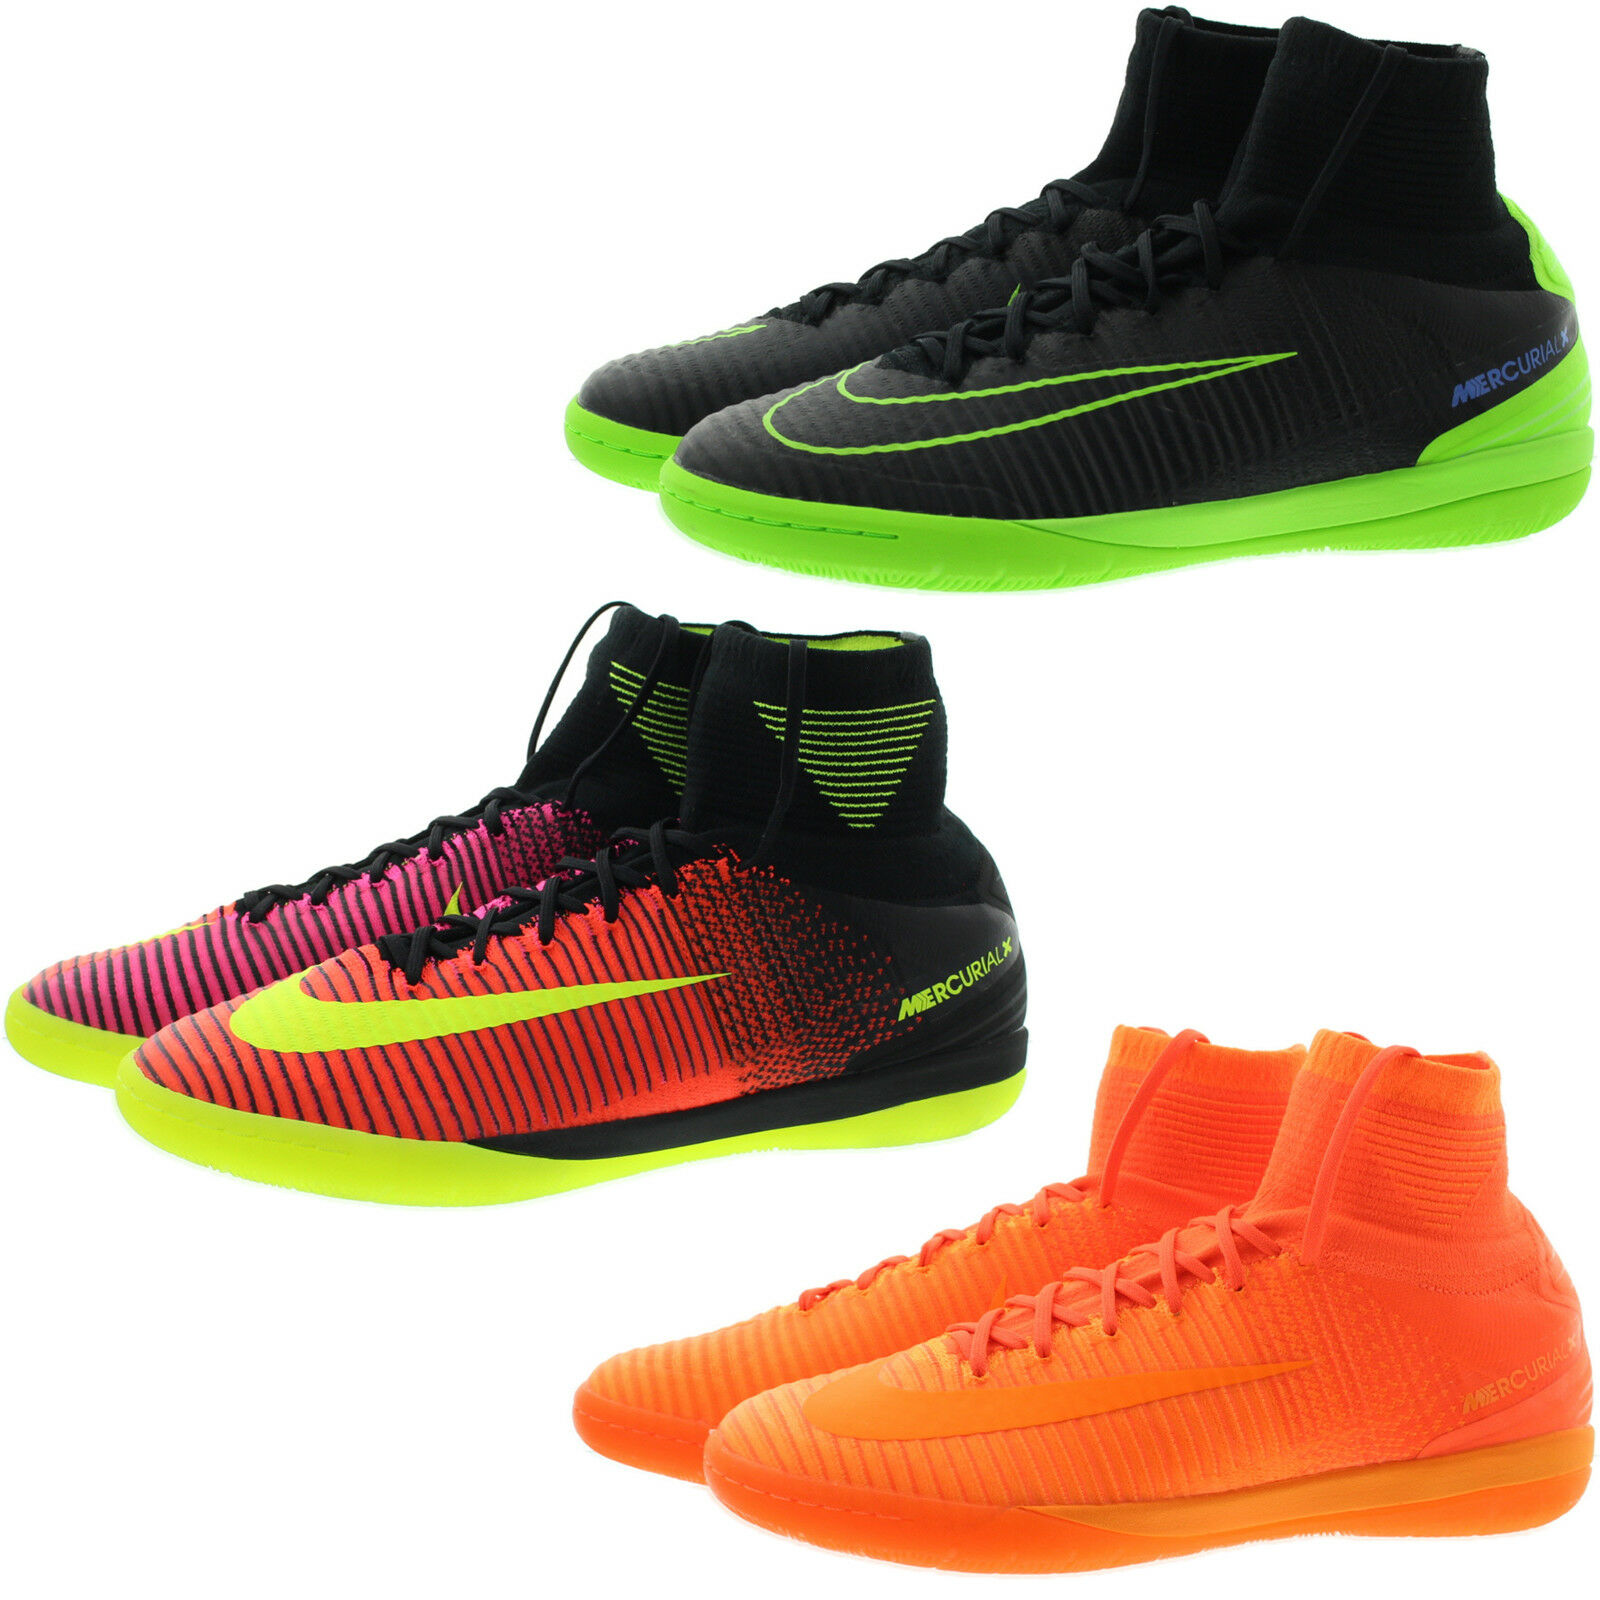 Nike 831976 Mens Mercurial IX Proximo II Indoor High Top Soccer shoes